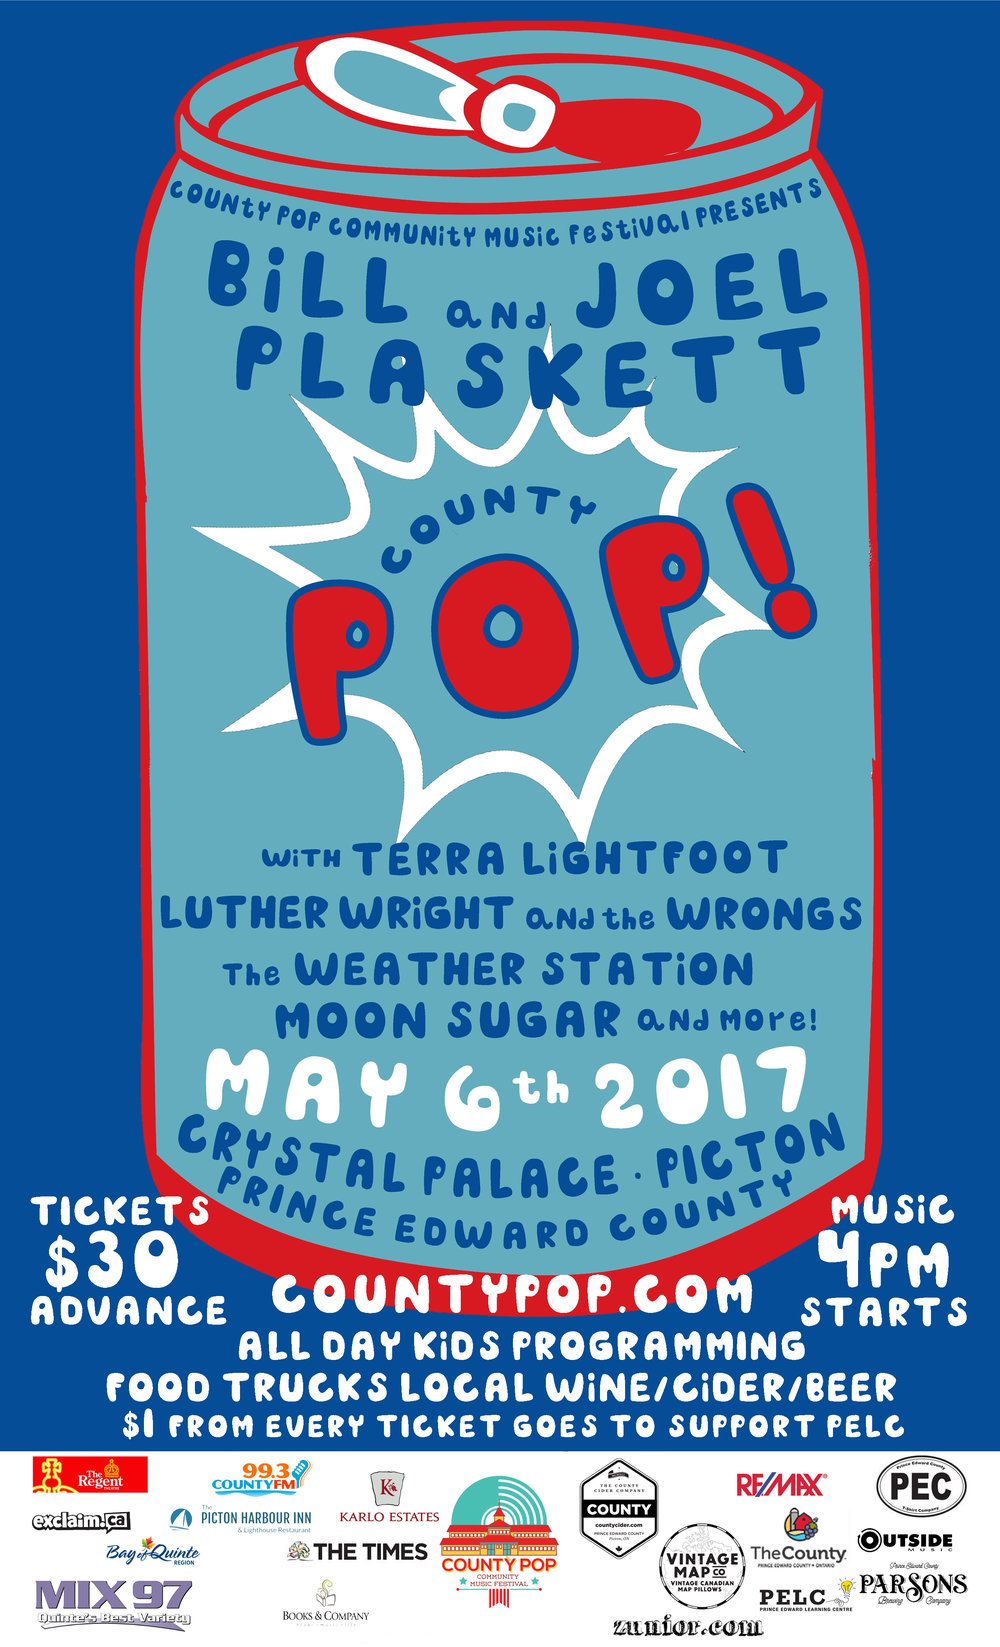 countypop-2017-poster-FINAL-updateMarch22.jpg